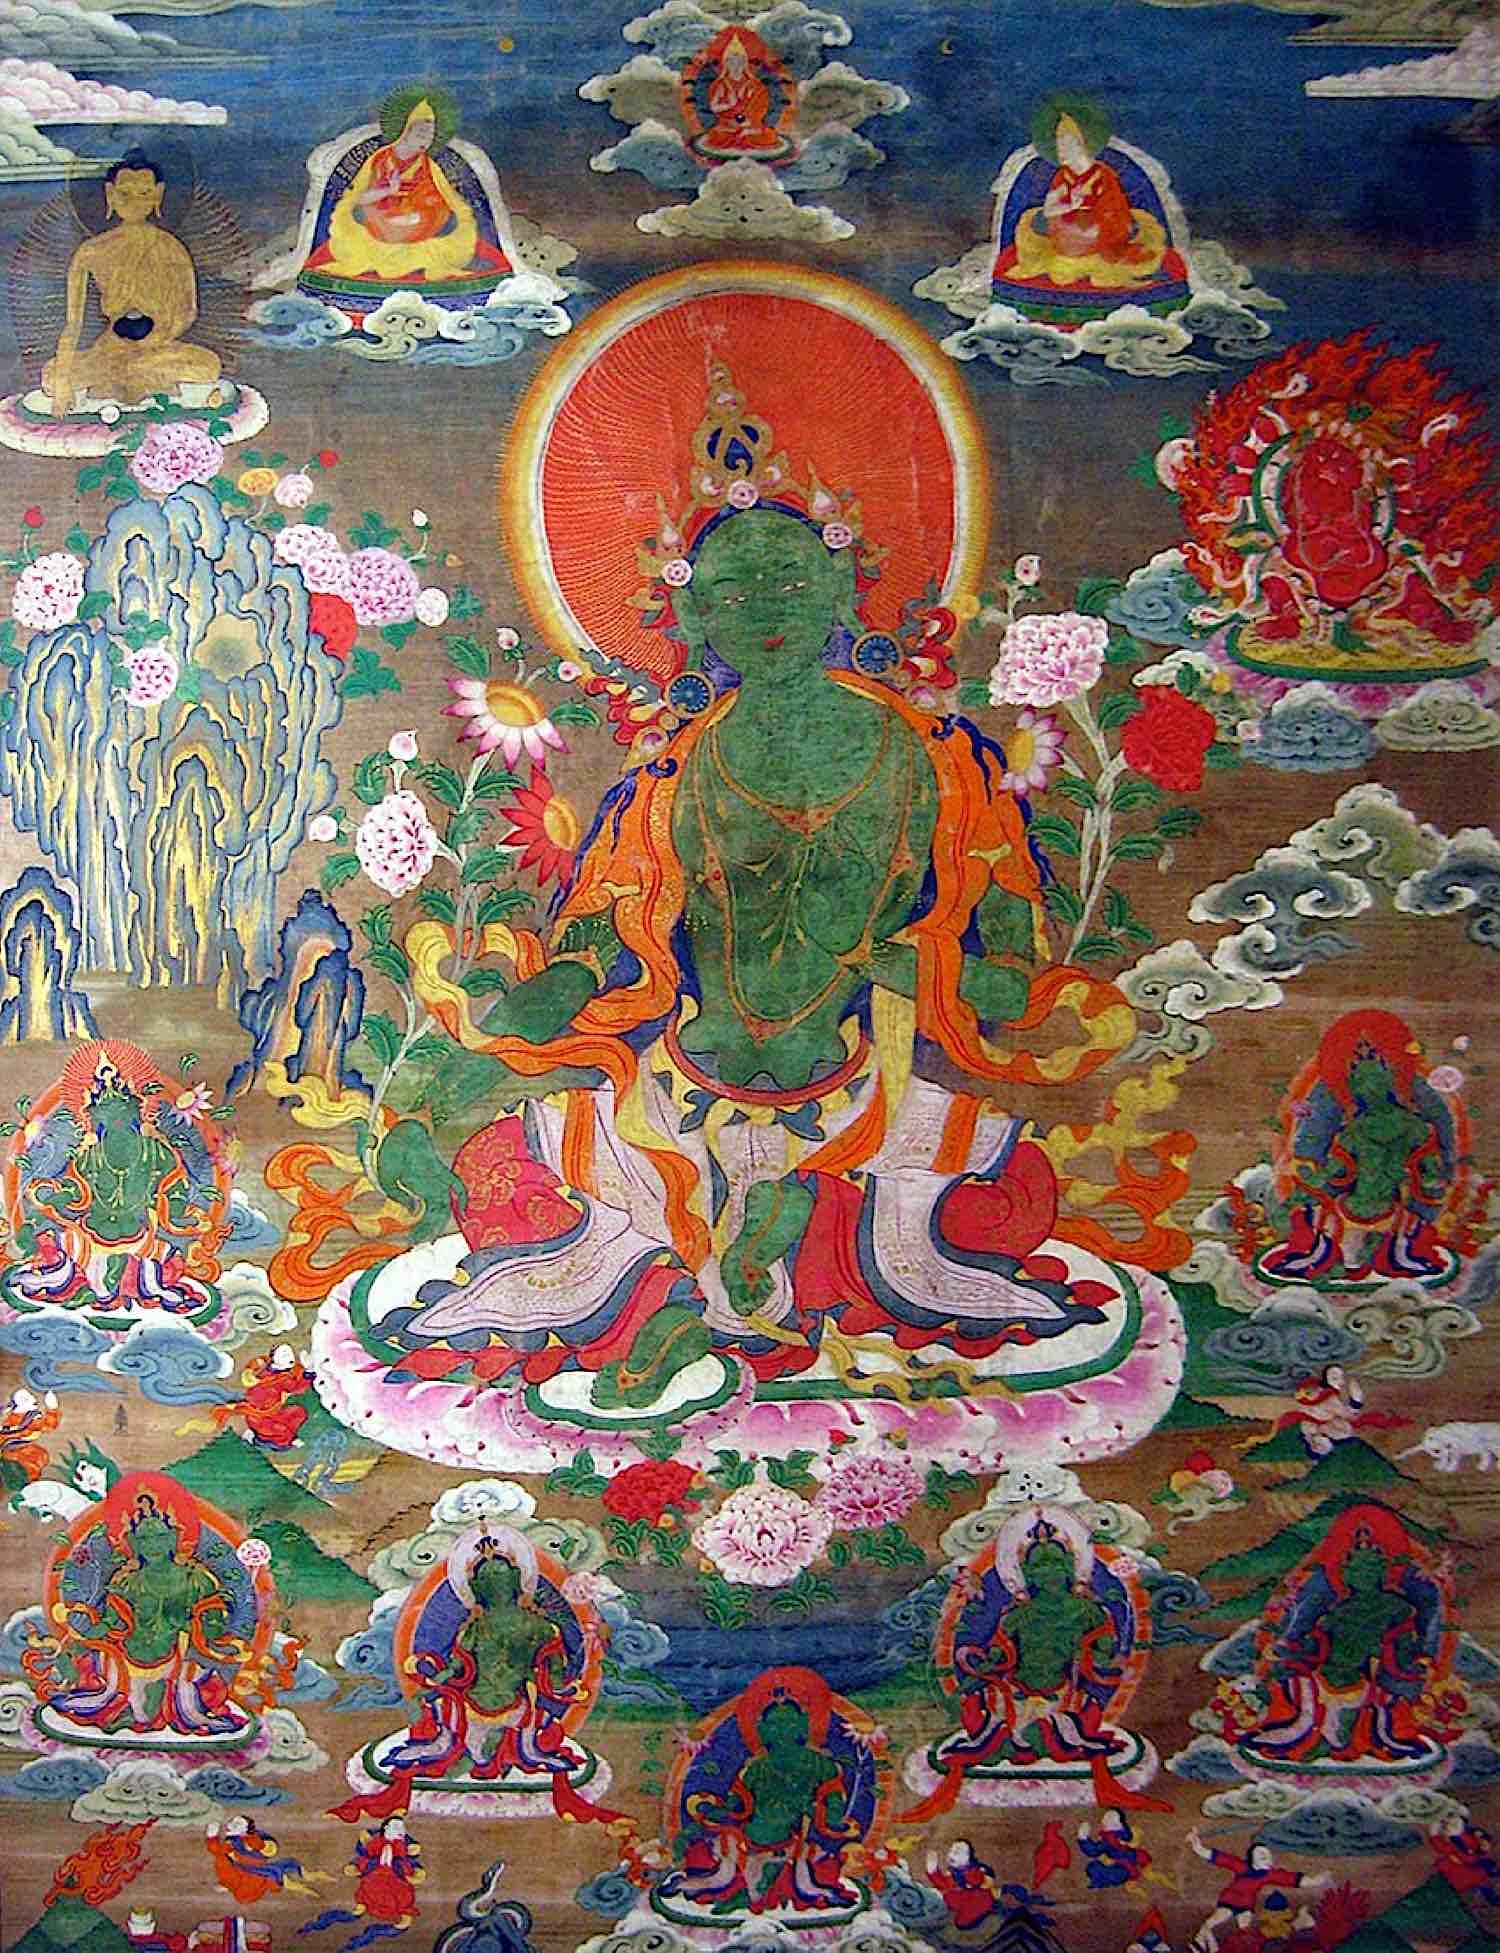 Buddha Weekly Old Tangkha of Green Tara with Hayagriva lineage gurus Shakyamuni Buddha Buddhism